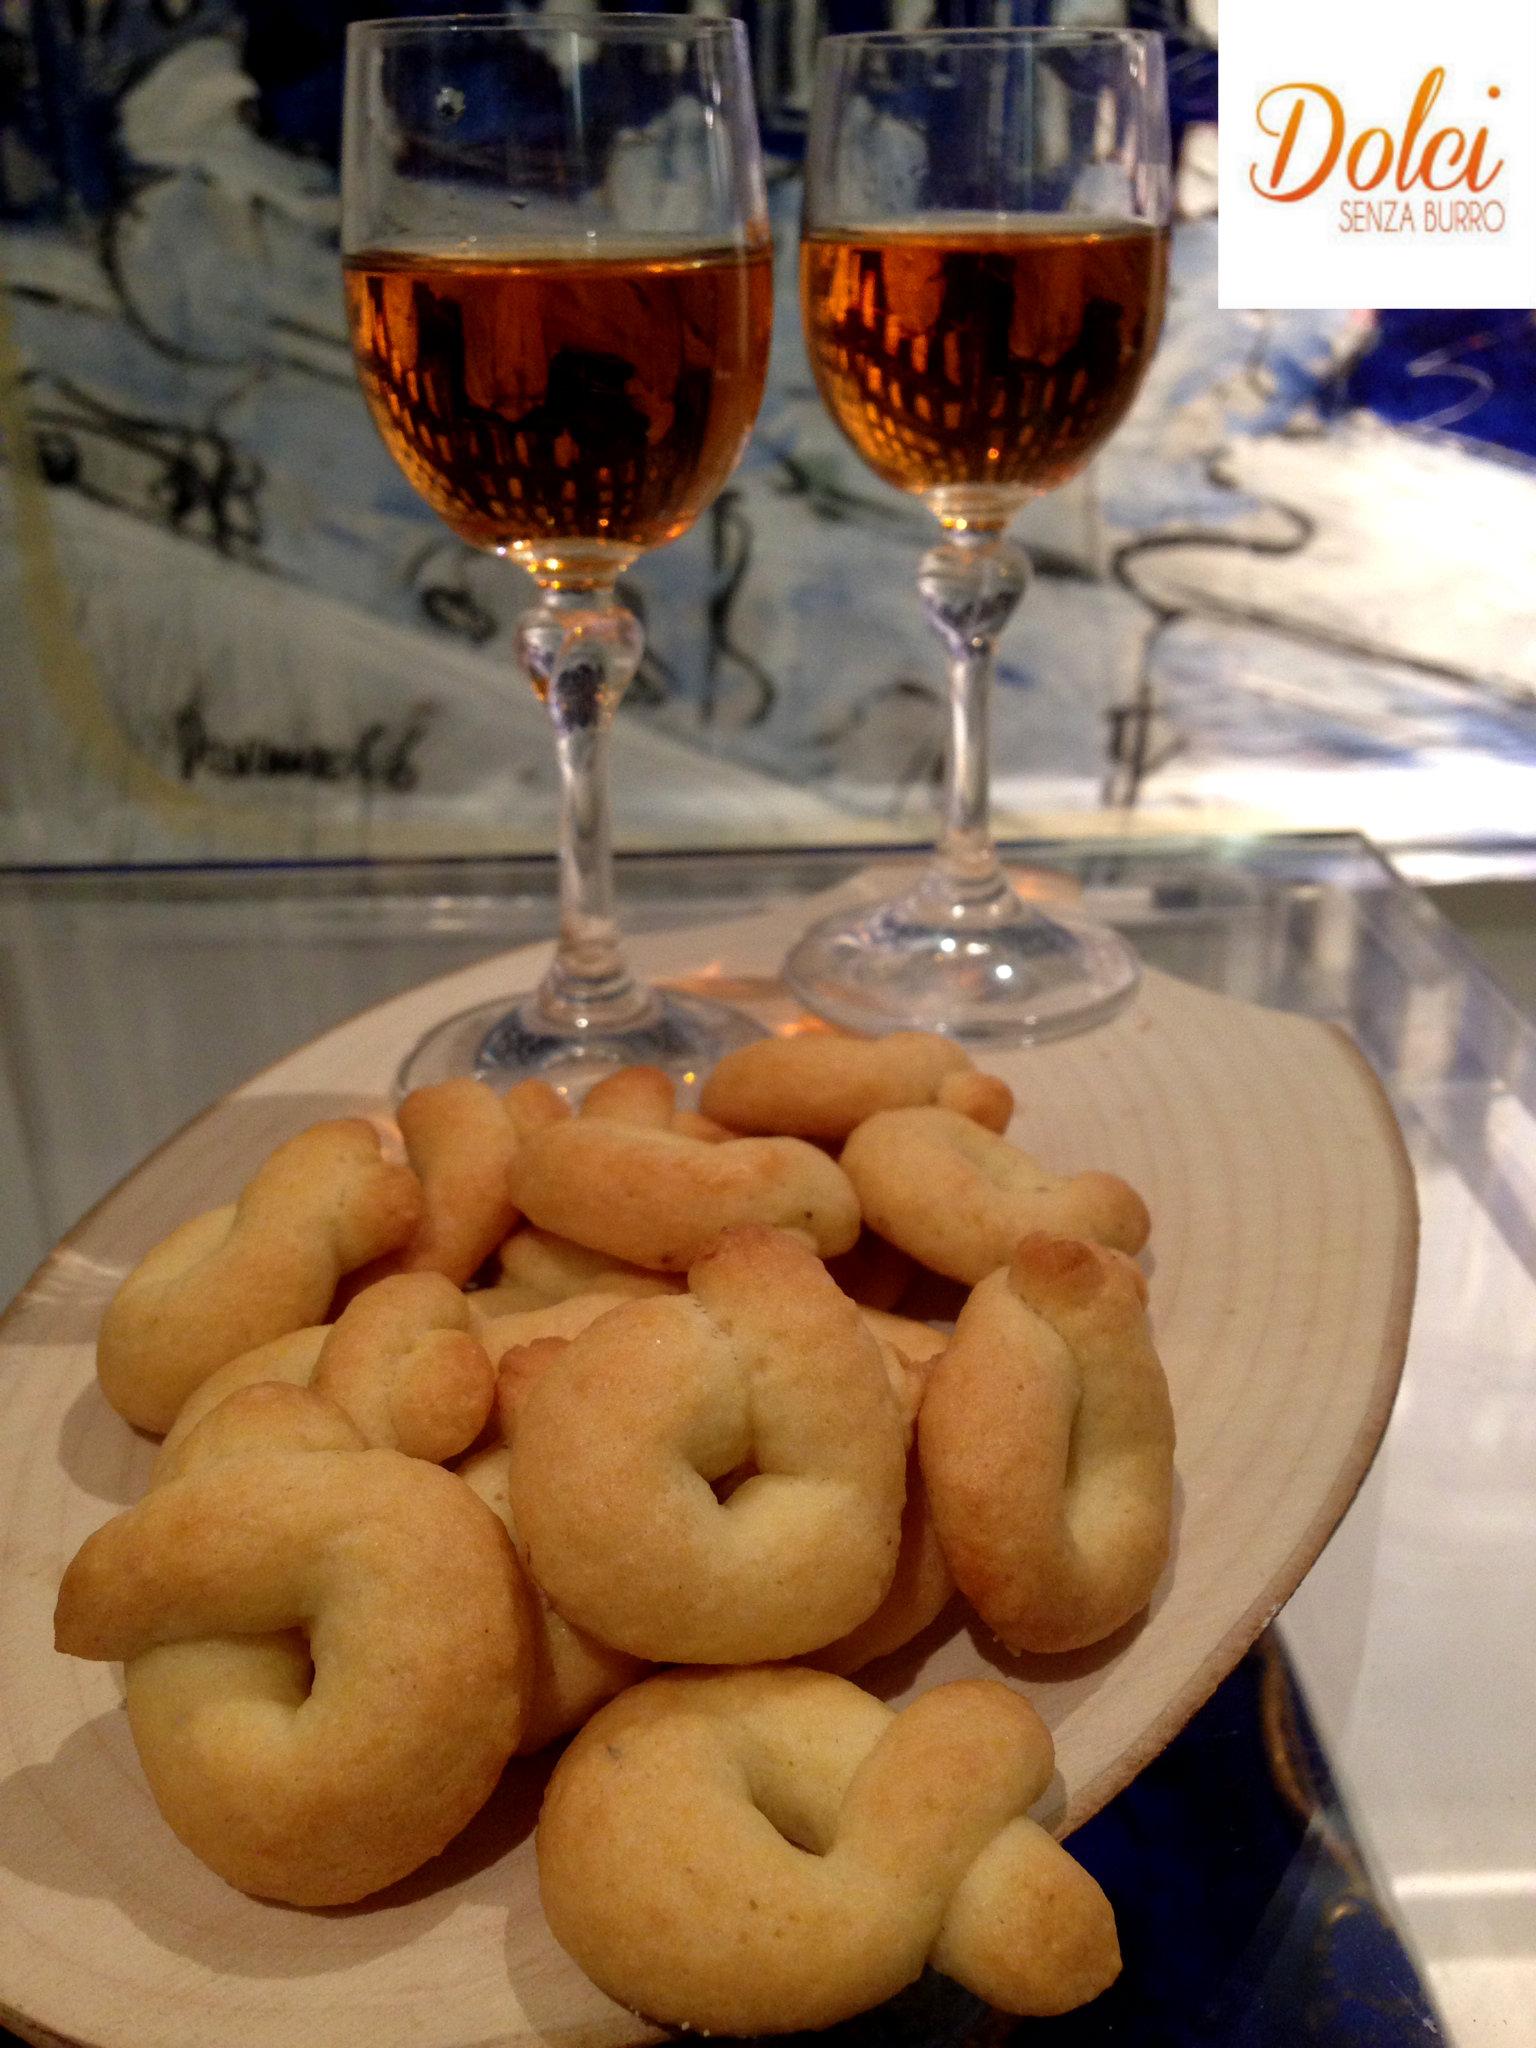 Taralli Dolci Senza Burro alla Malvasia, biscotti senza burro e uova di dolci senza burro